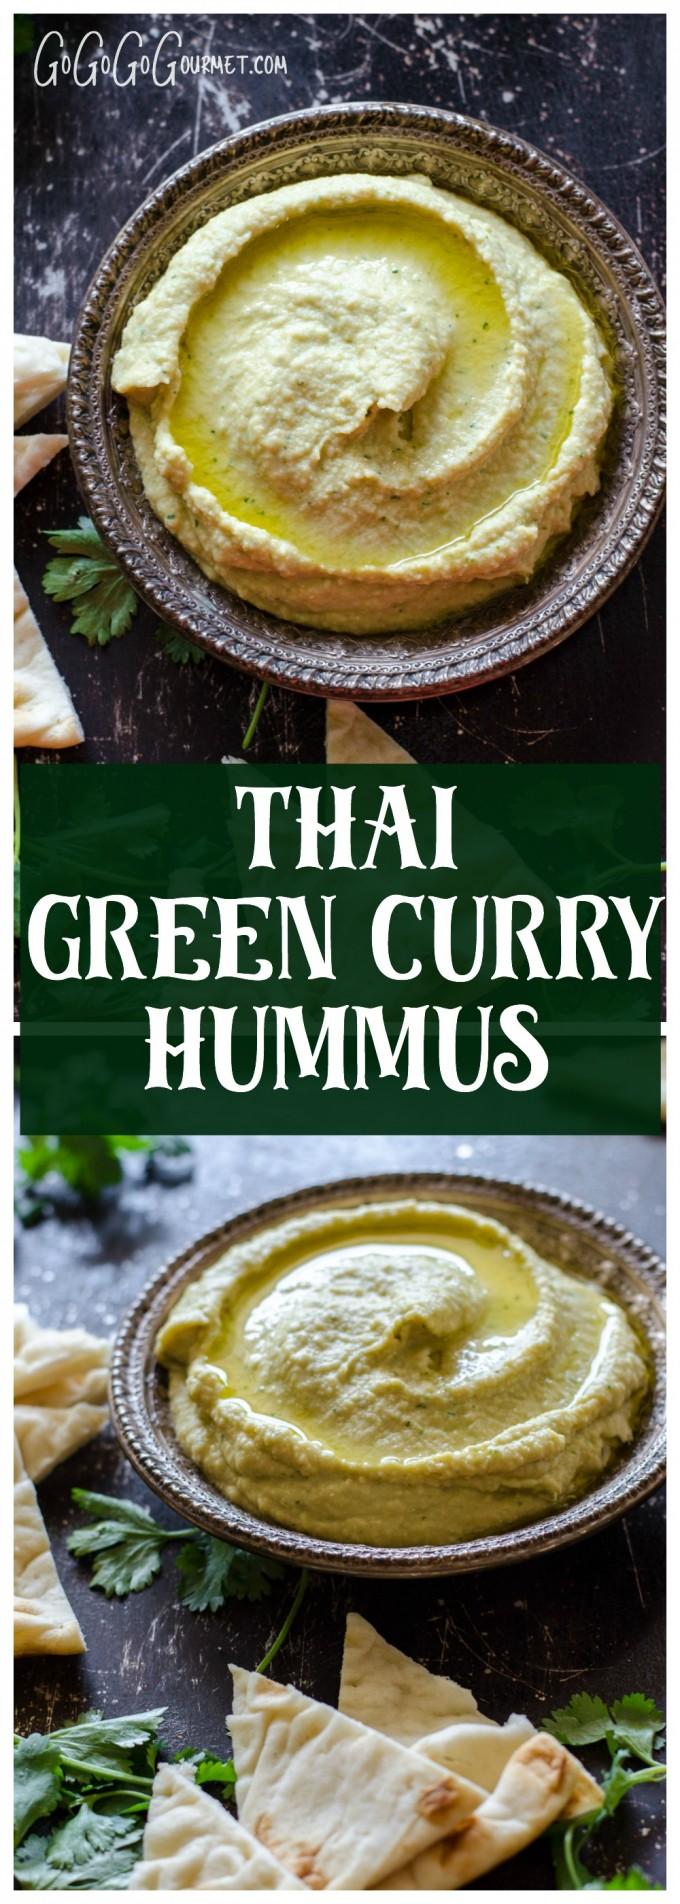 Easy, spicy and HEALTHY! You'll love this Thai Green Curry Hummus. | Go Go Go Gourmet via @gogogogourmet